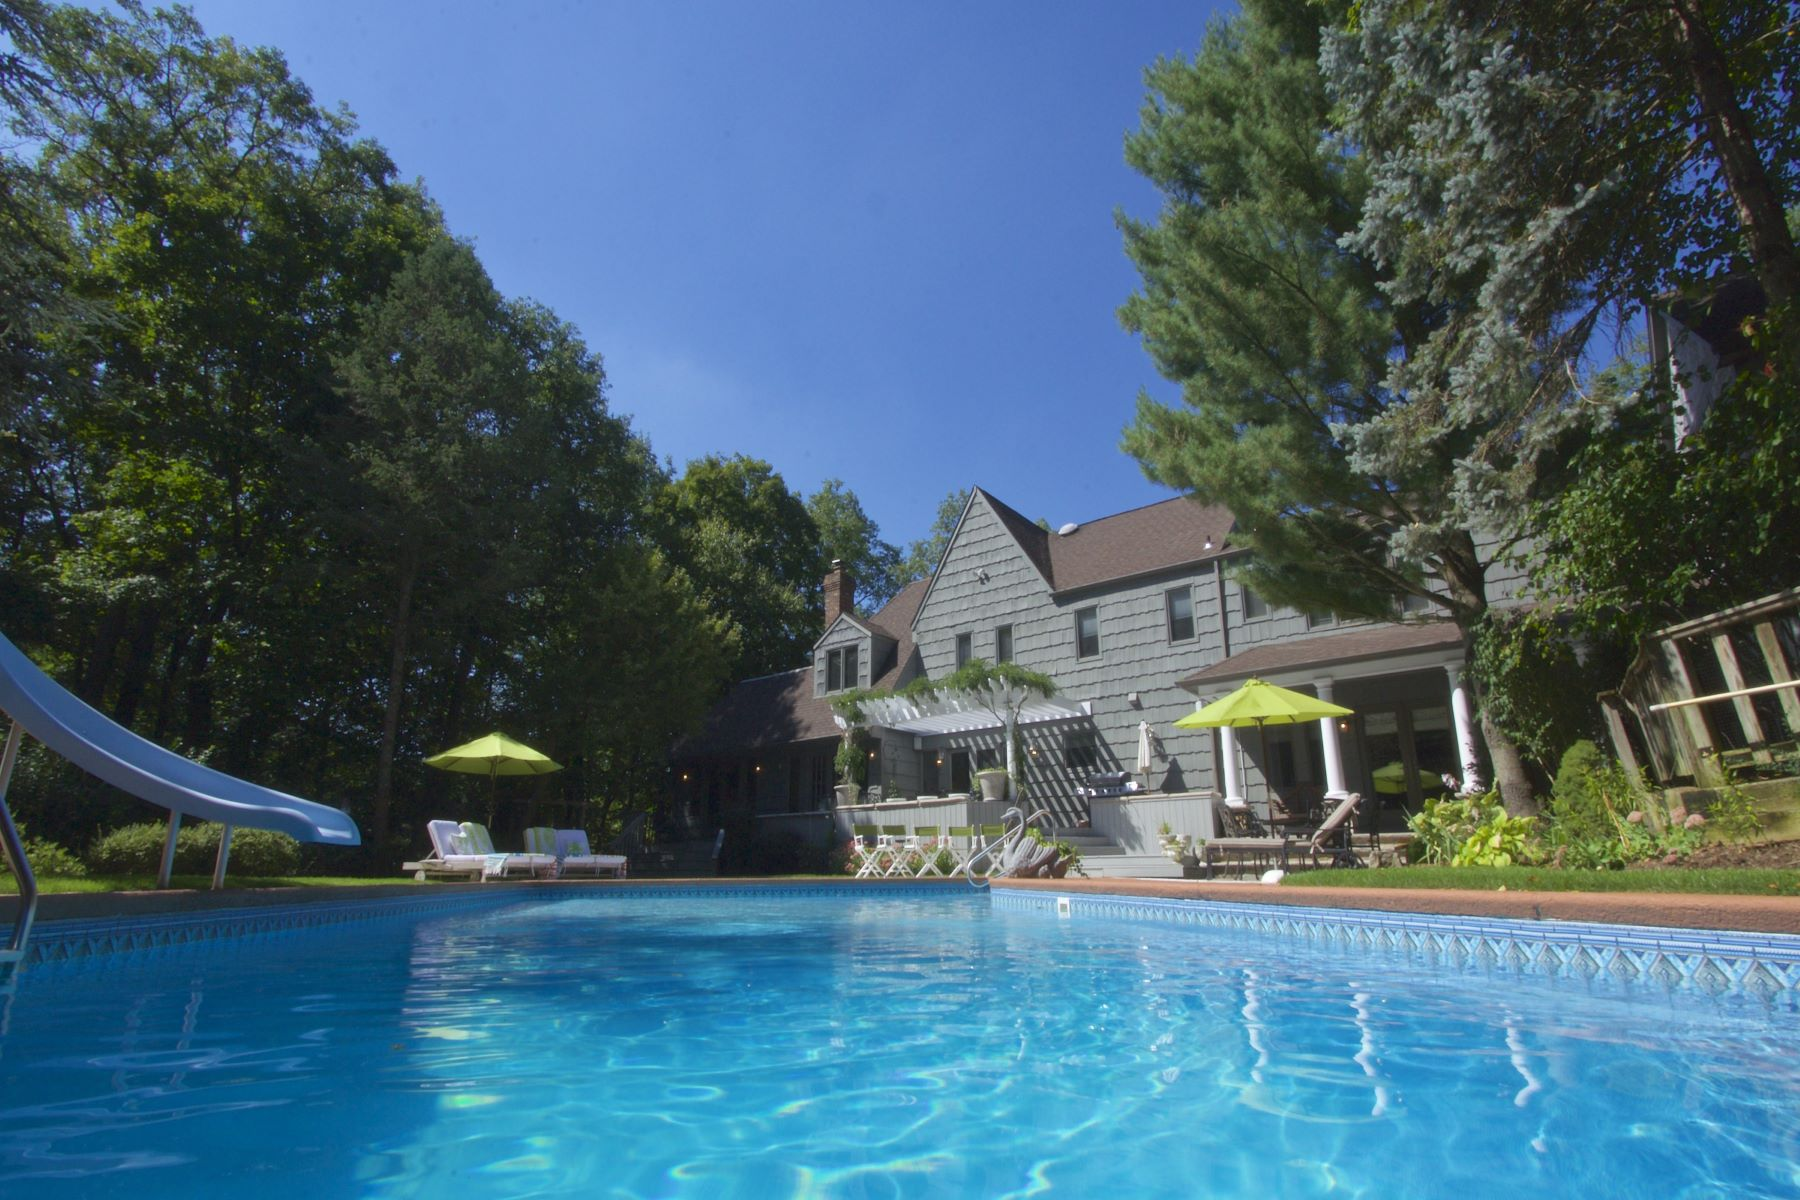 独户住宅 为 销售 在 Impeccably Presented English Manor Style. 6 India Brook Drive Mendham Township, 新泽西州, 07945 美国